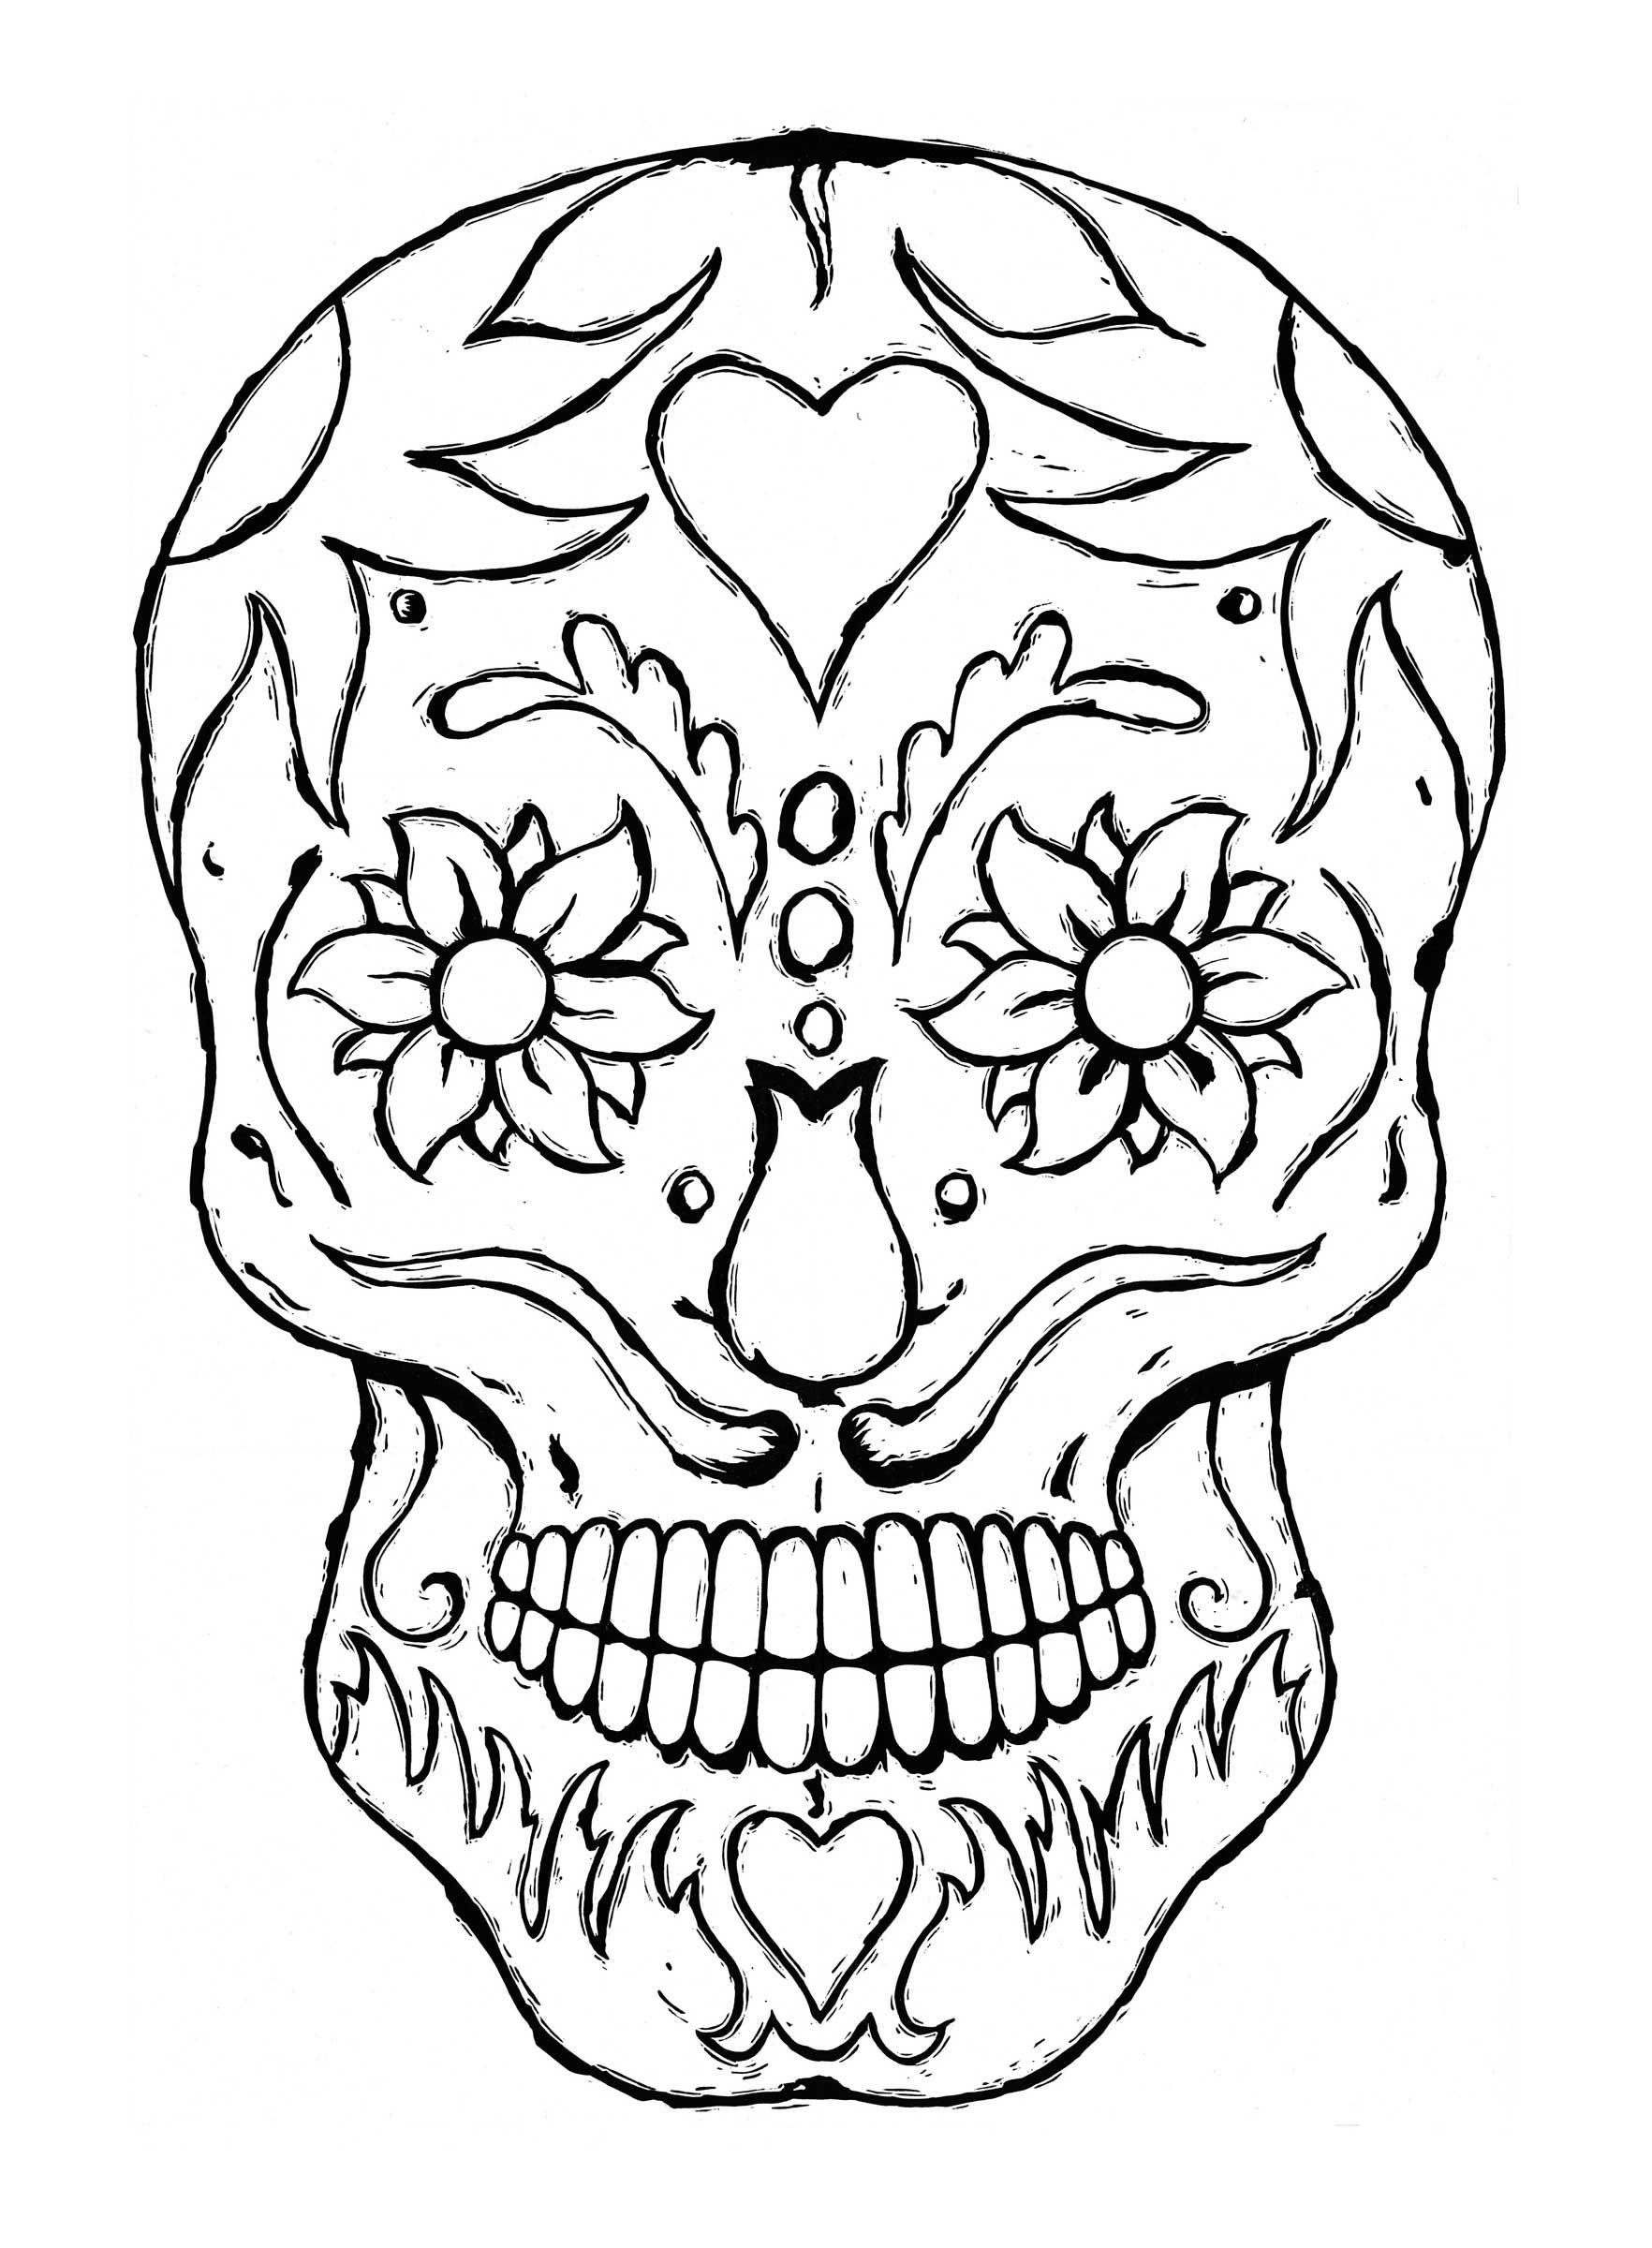 Printable sugar skull coloring sheet | Create/Make it/1234/TJ harris ...